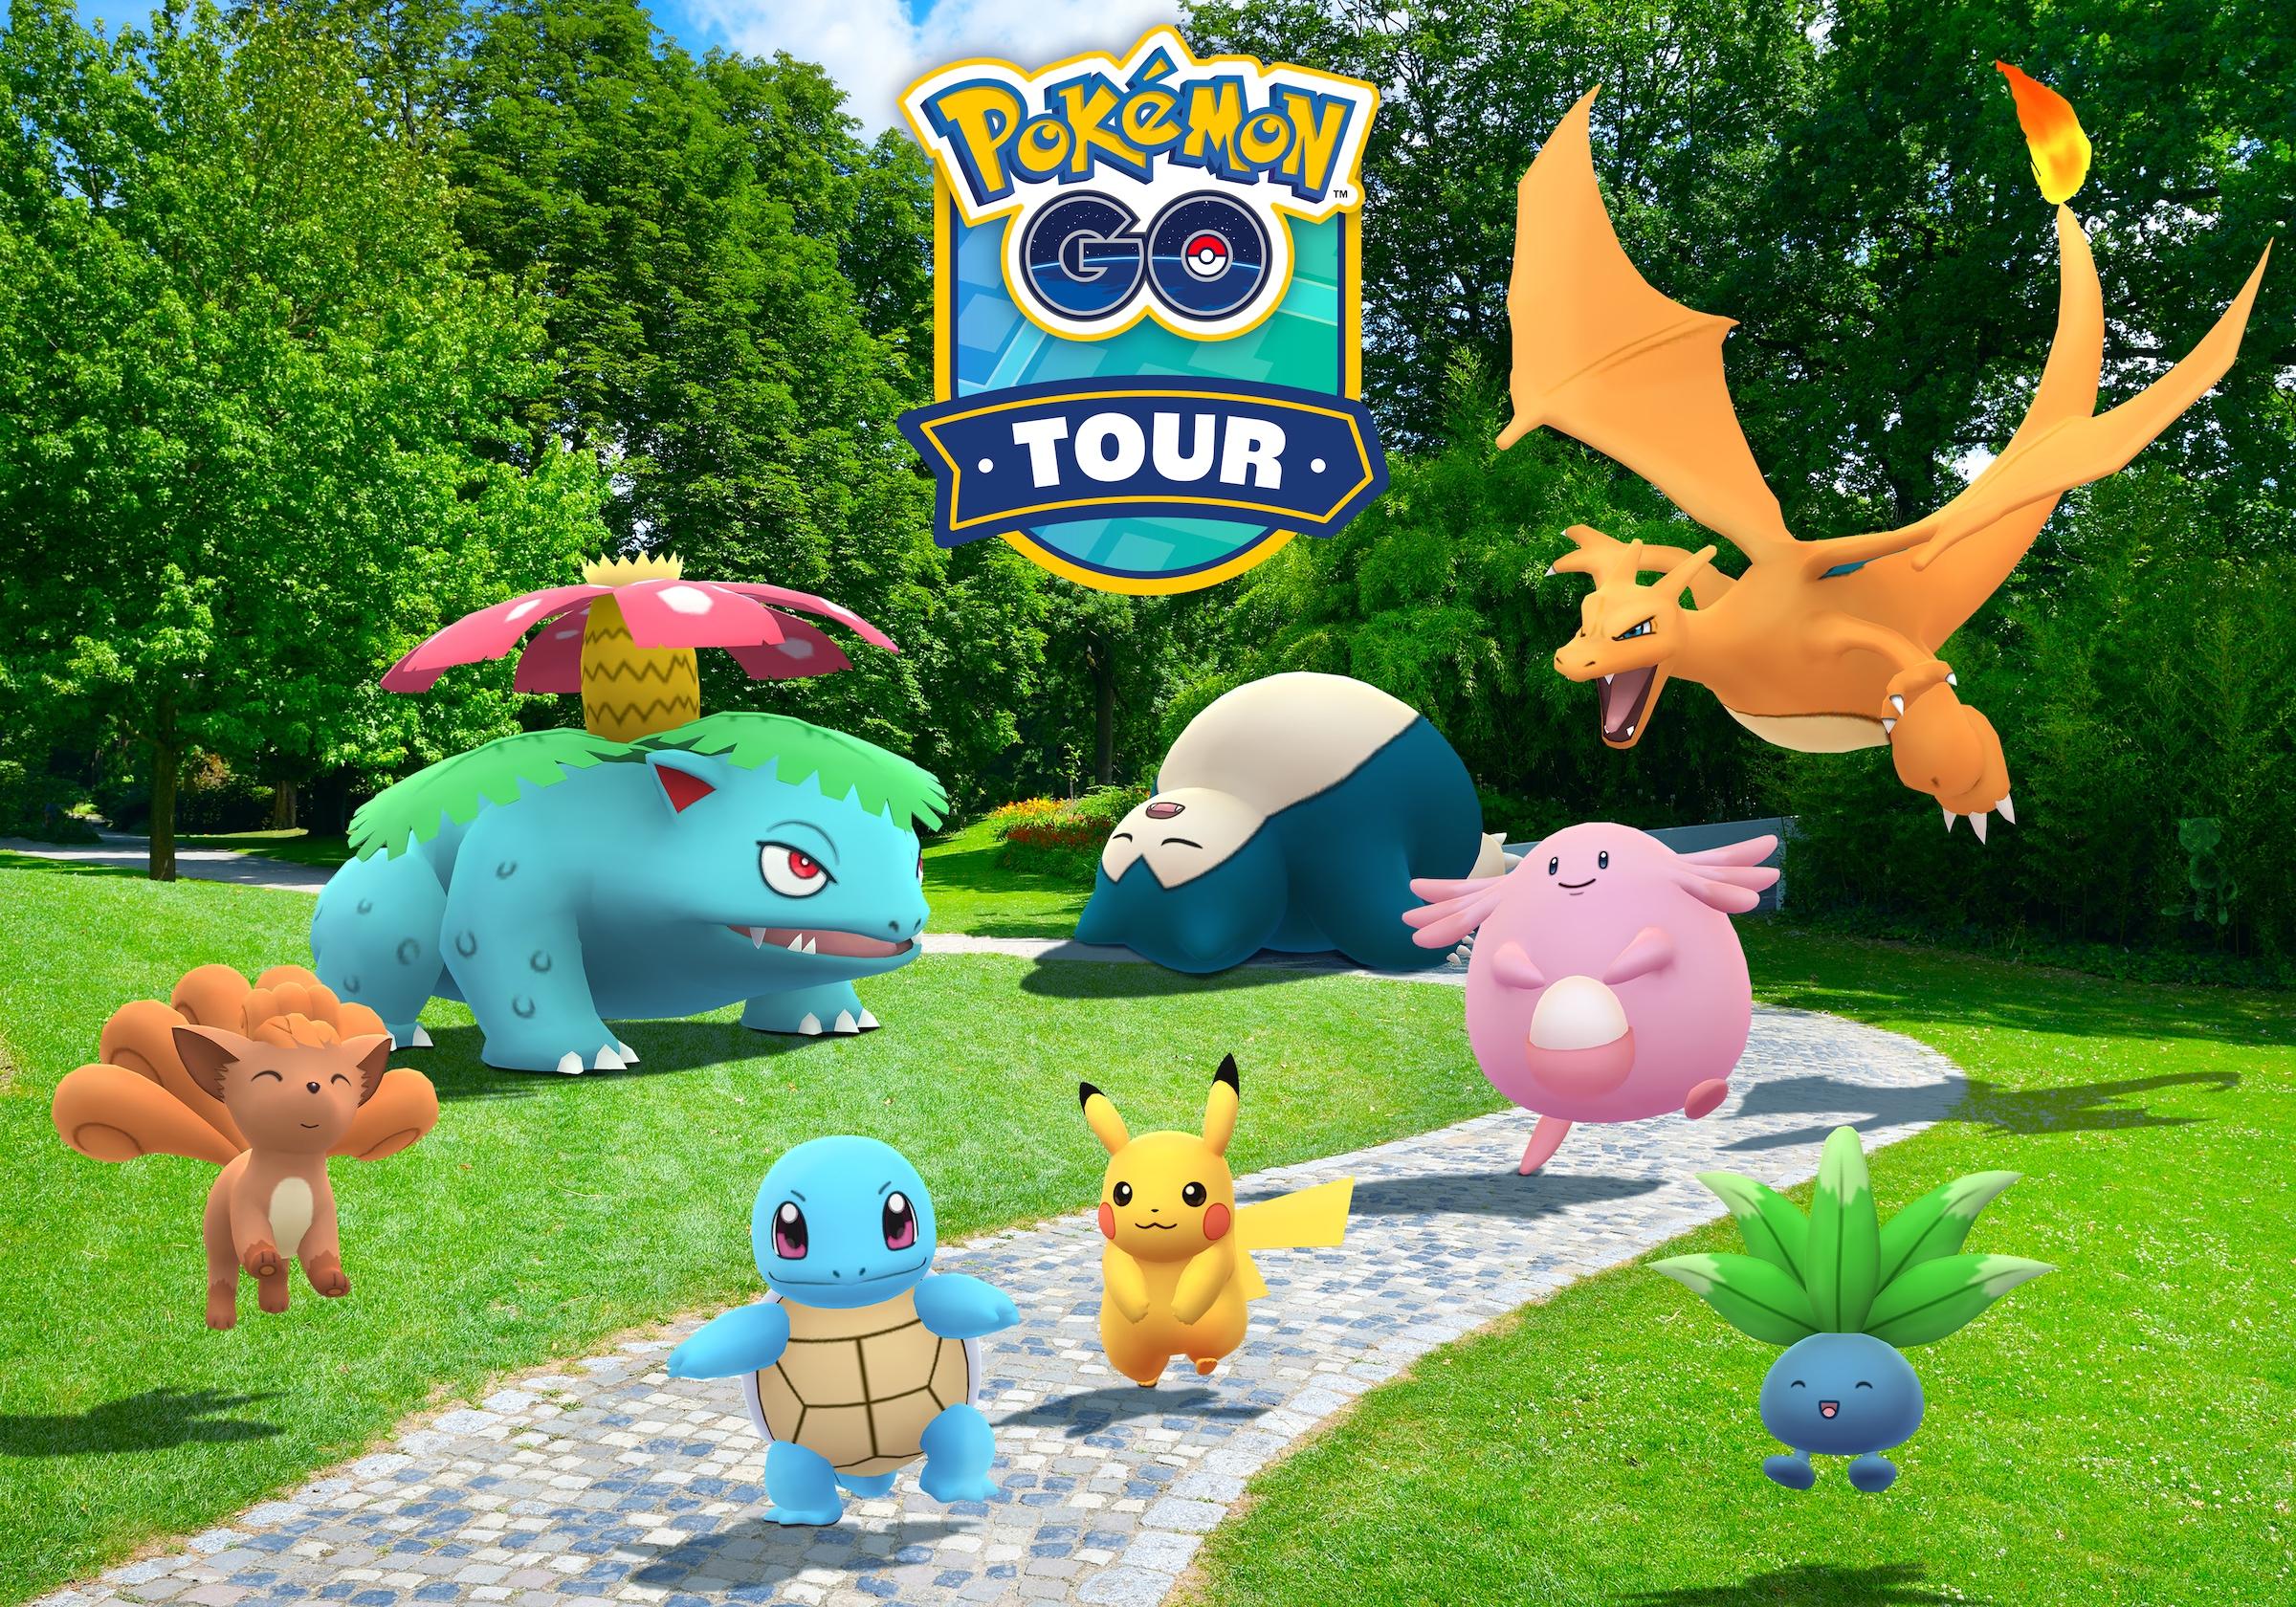 Various Pokemon frolic in artwork for Pokémon Go's Tour Kanto event